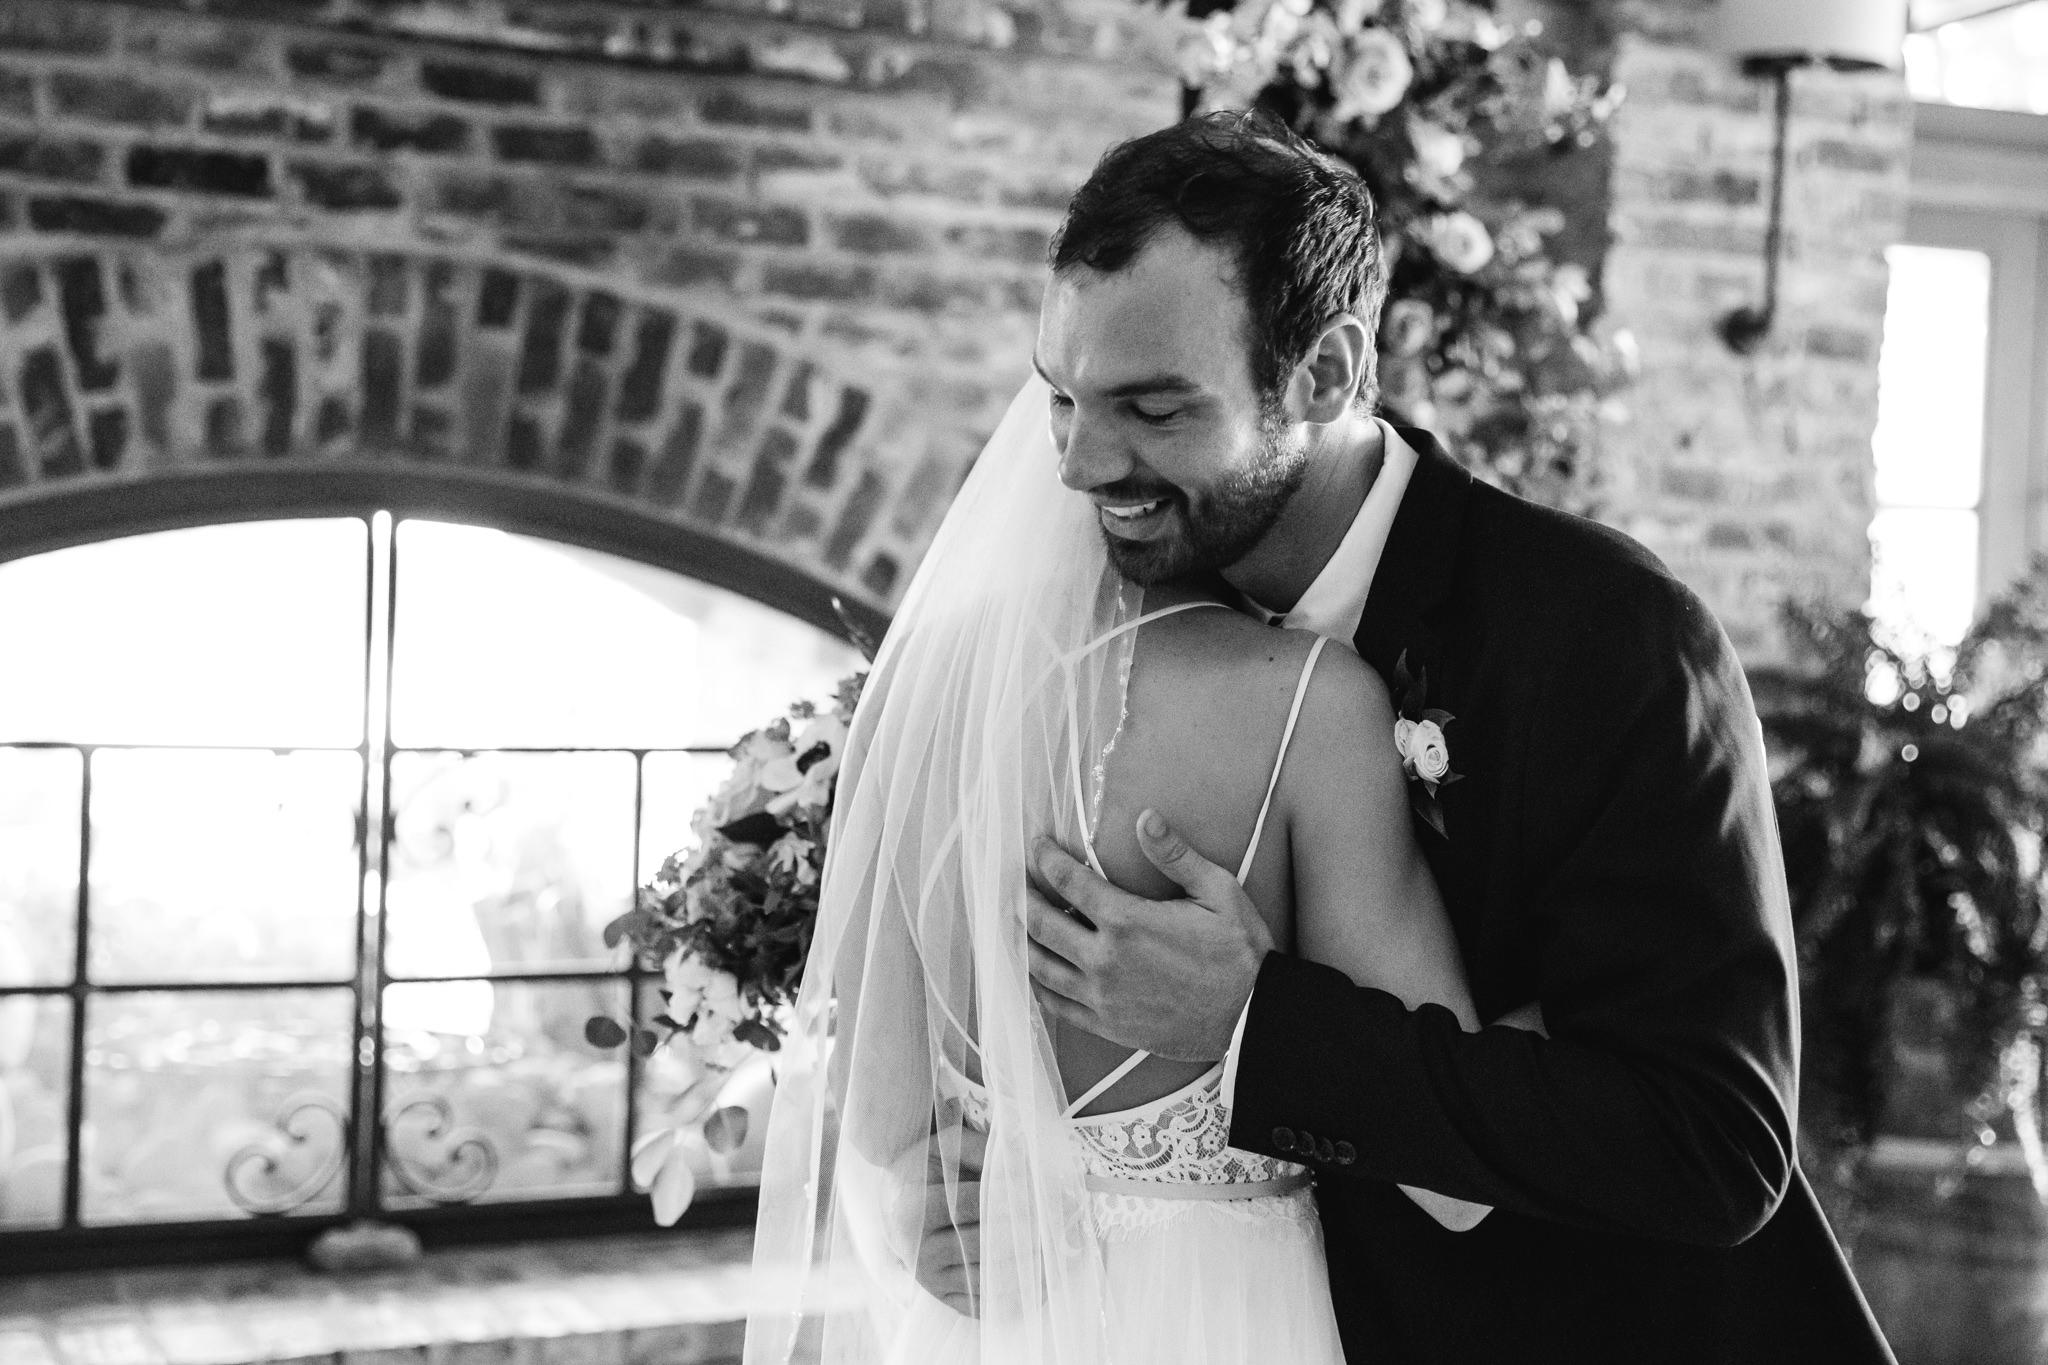 phantom-canyon-brewery-colorado-springs-wedding-photographer-279.jpg